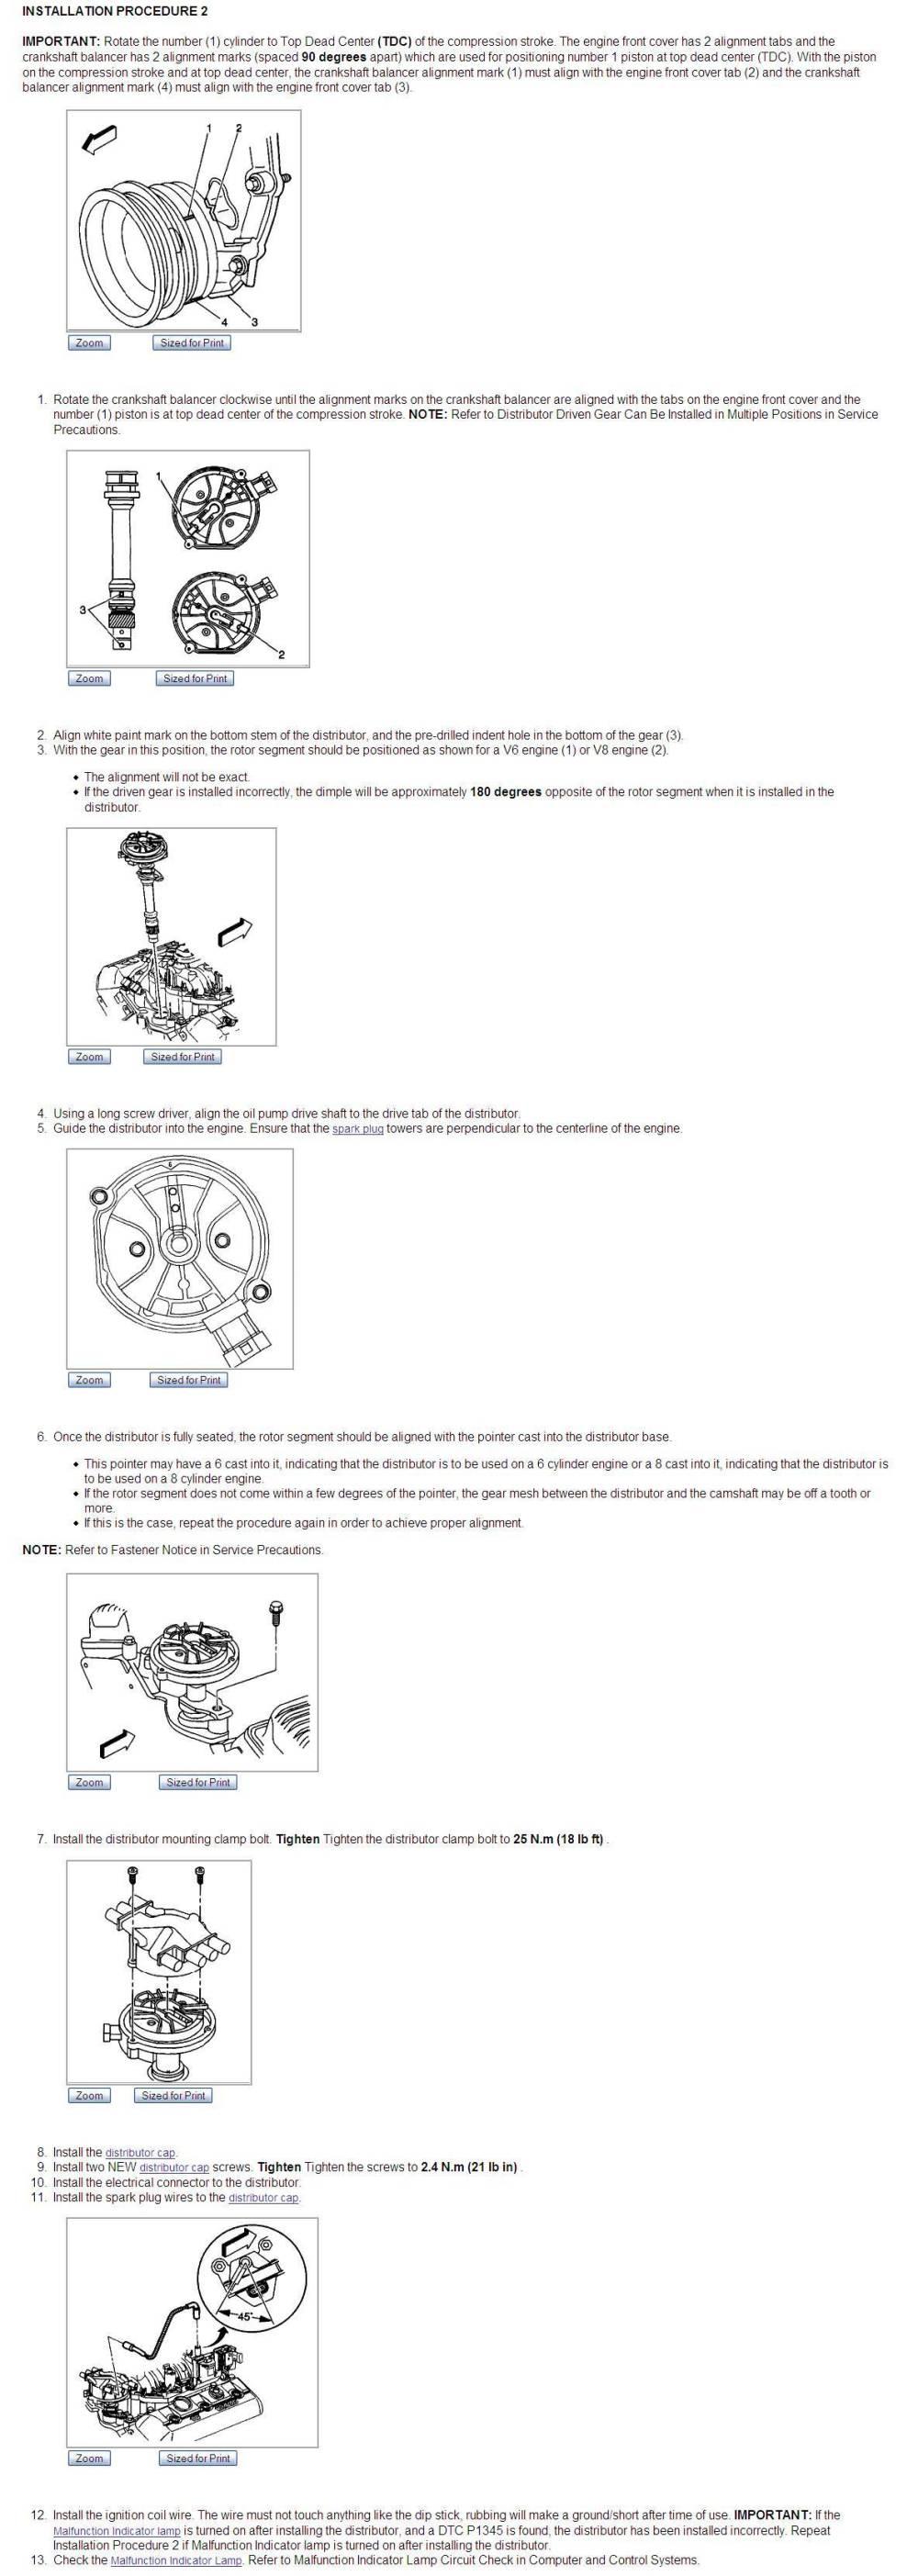 medium resolution of https www 2carpros com images external distributorinstall0043